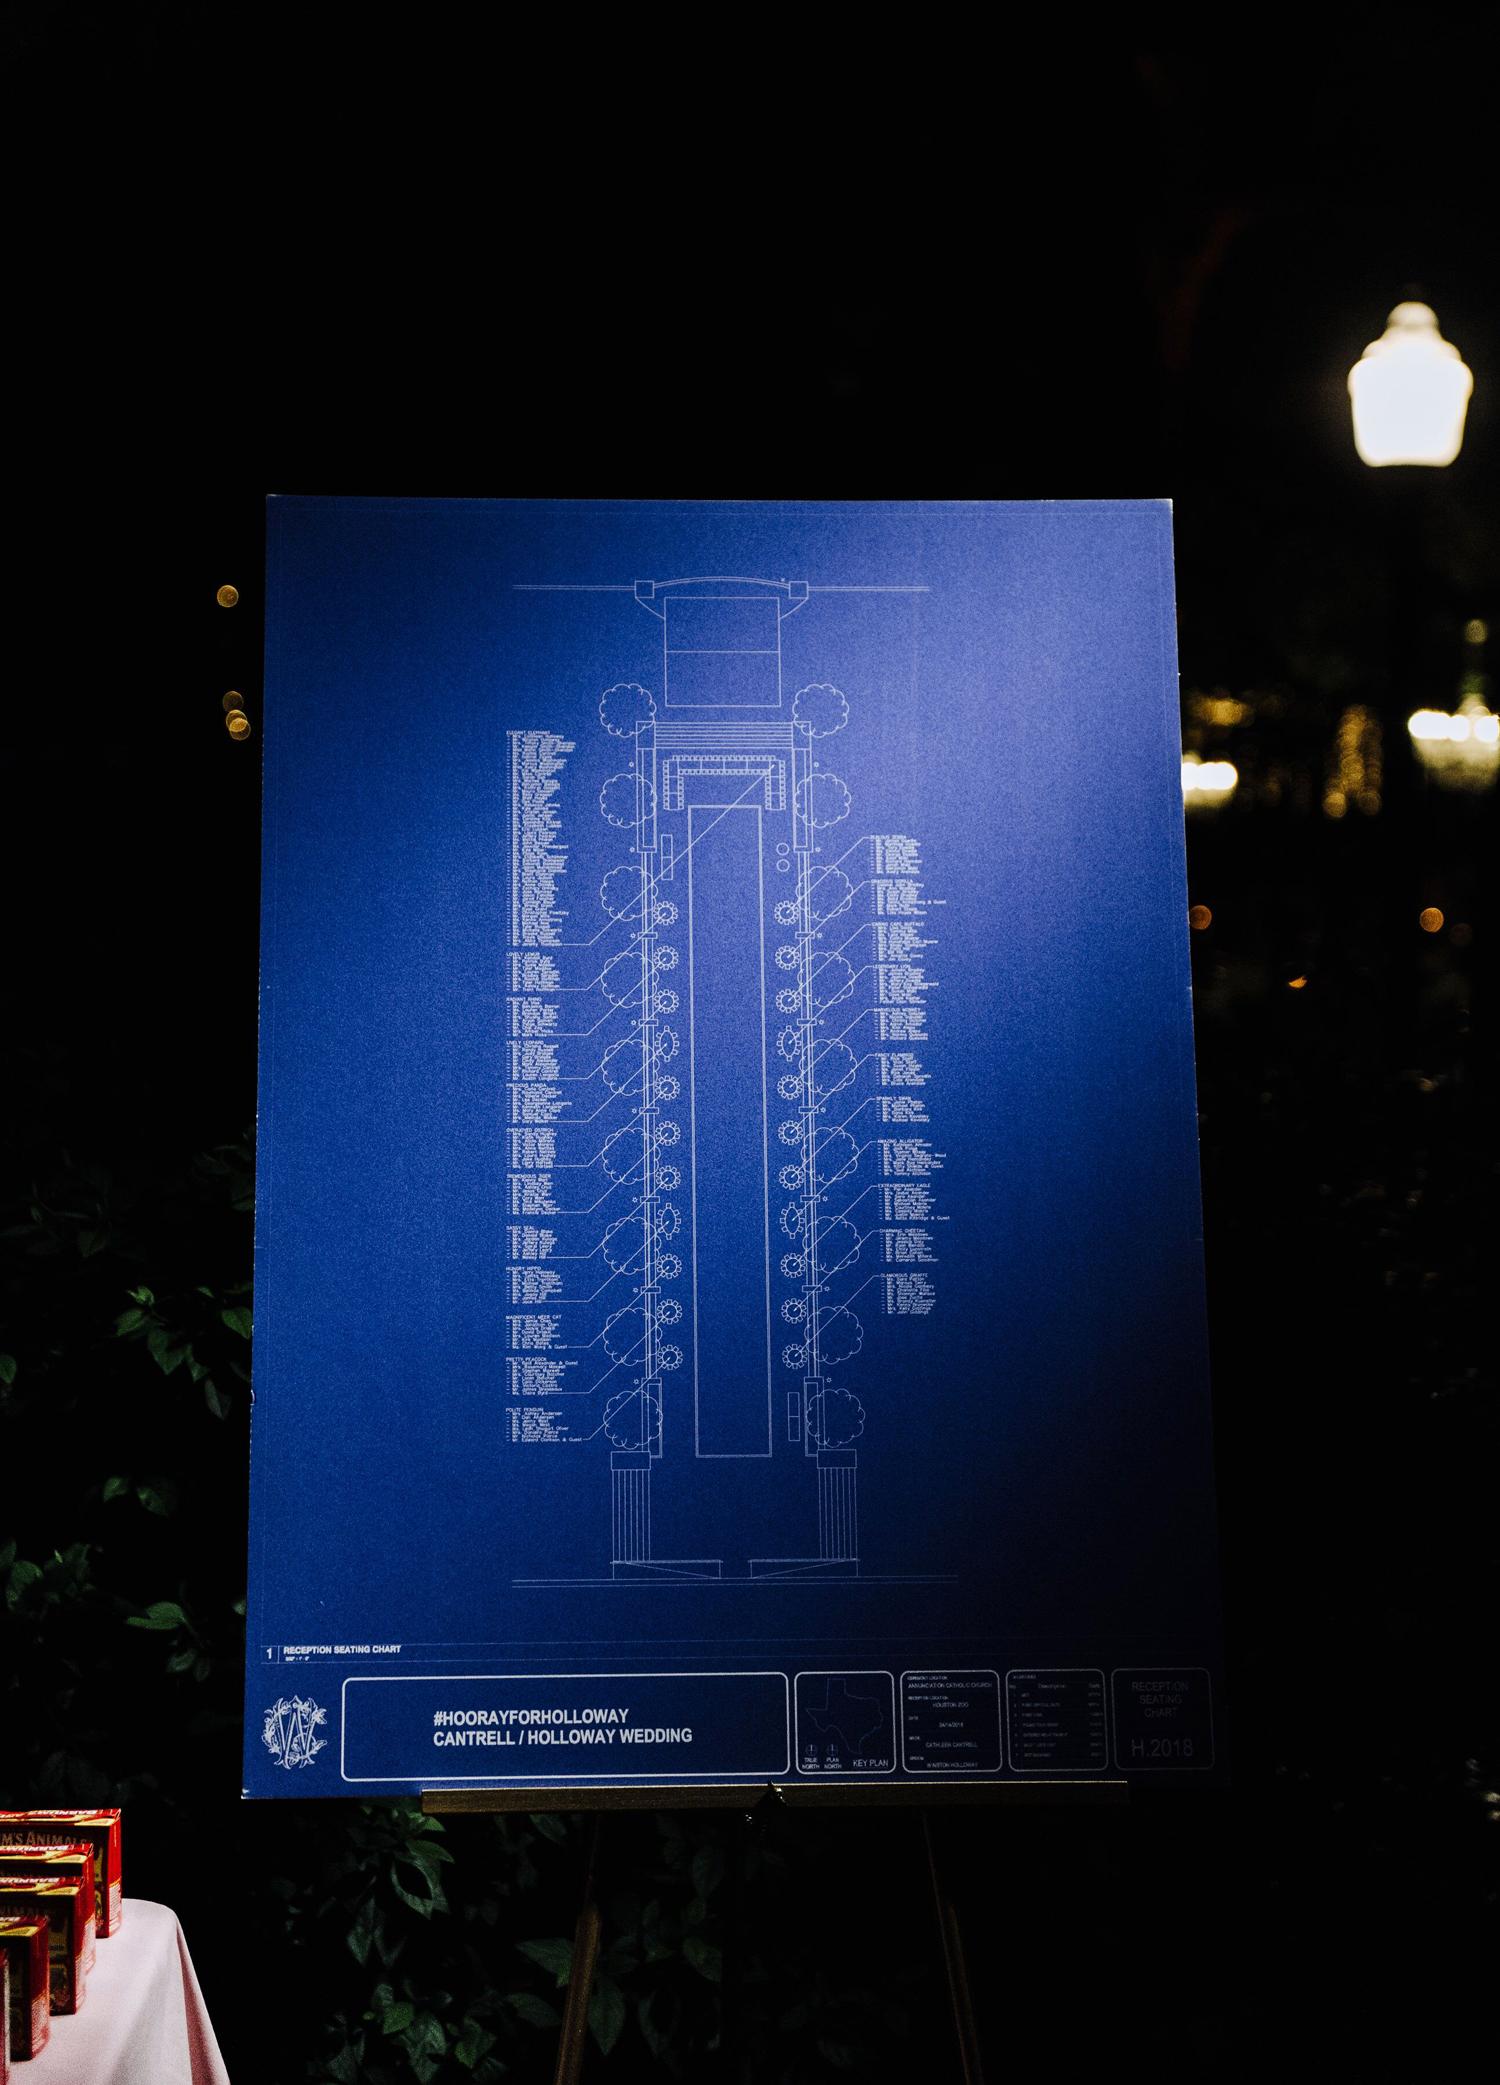 cathleen and winston wedding blueprint seating chart